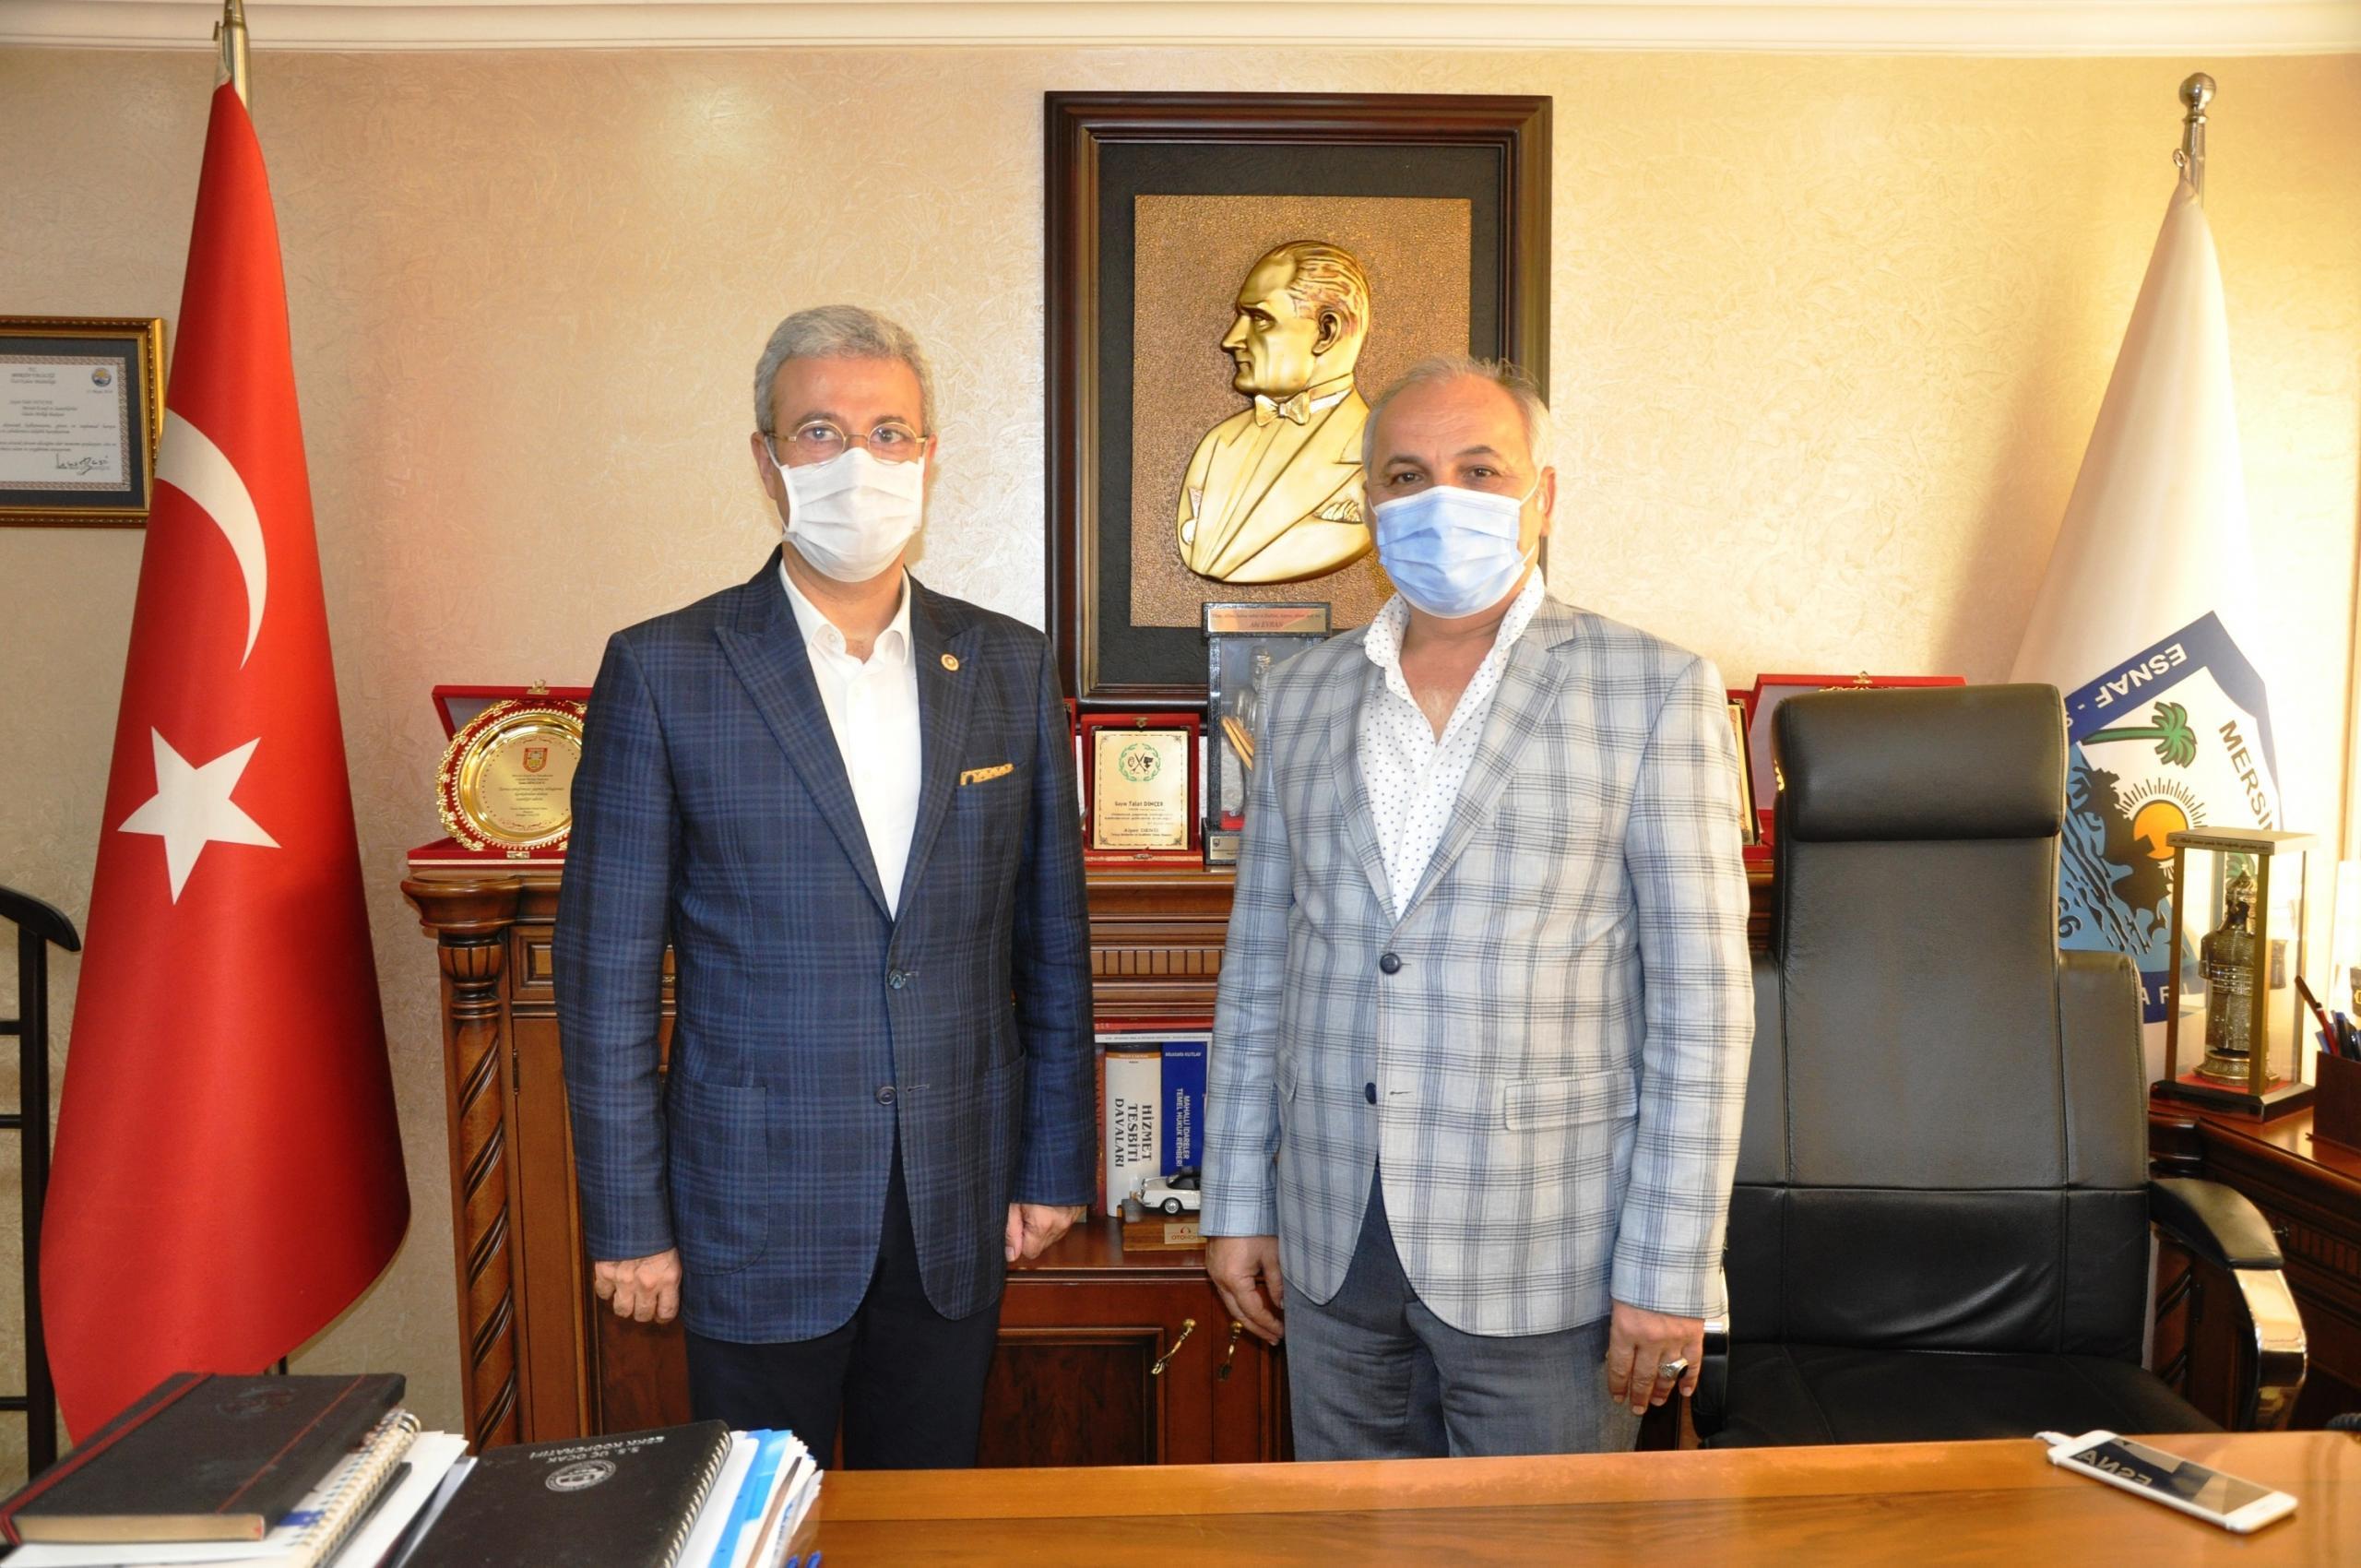 CHP Mersin Milletvekili Antmen'den Başkan Dinçer'e ziyaret